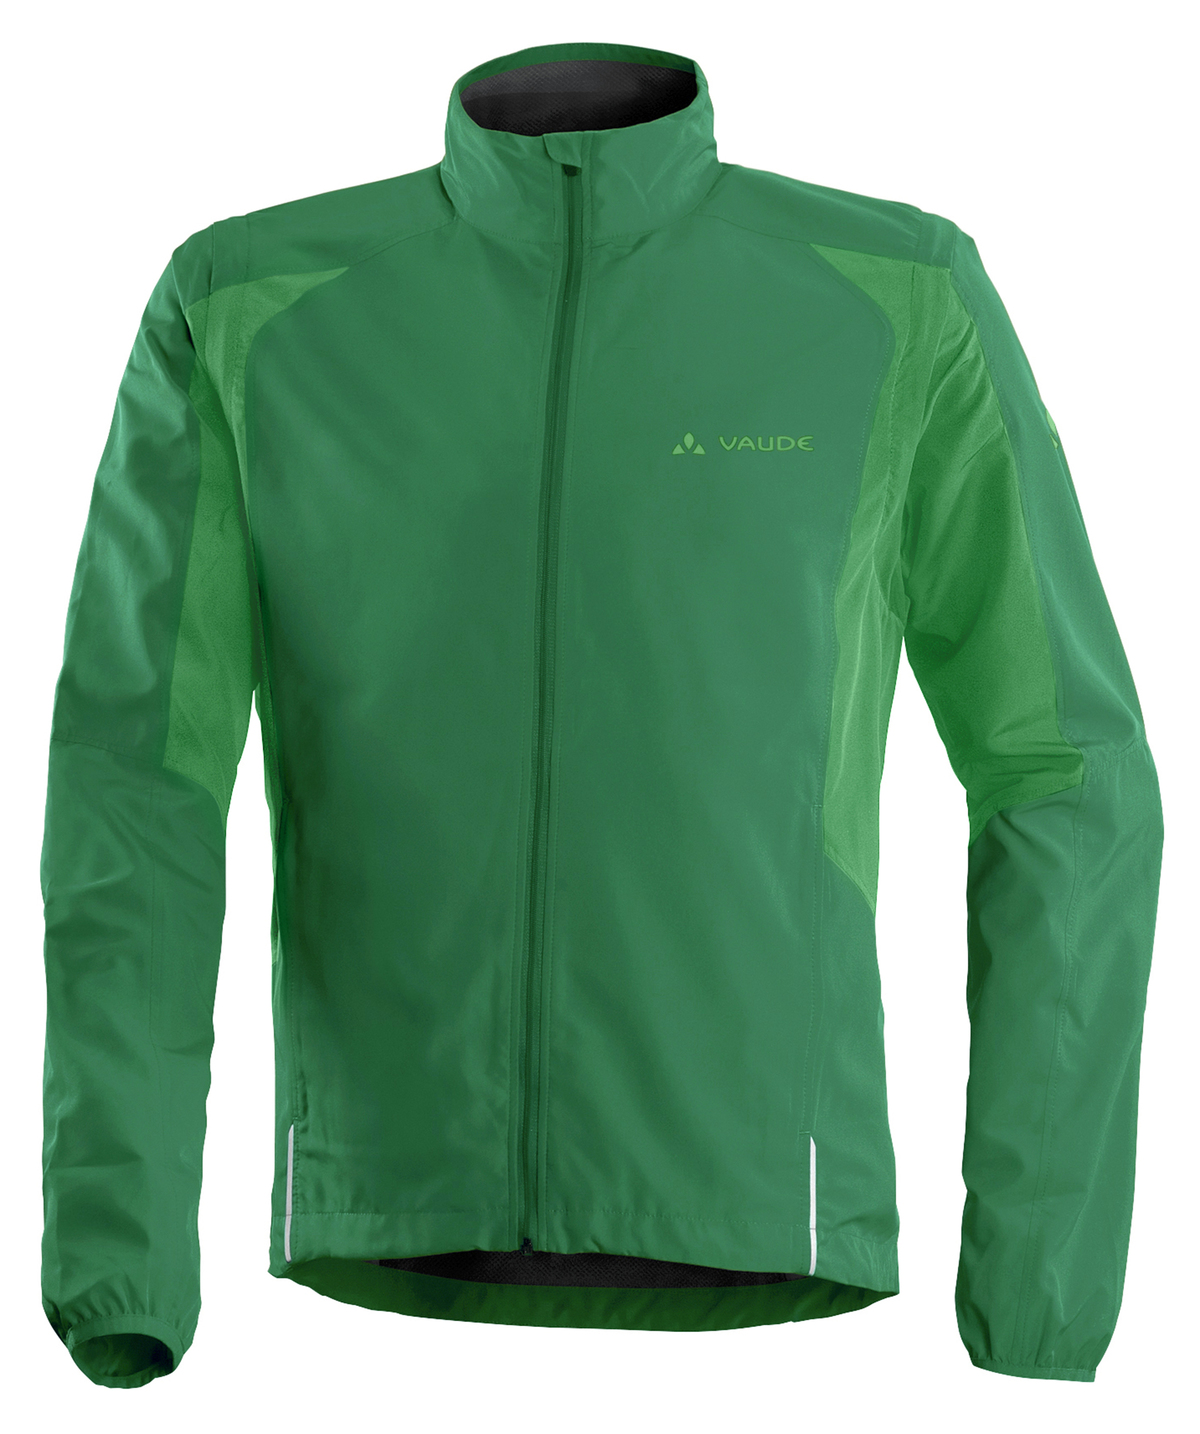 Men´s Dundee Classic ZO Jacket trefoil green Größe XXXL - schneider-sports